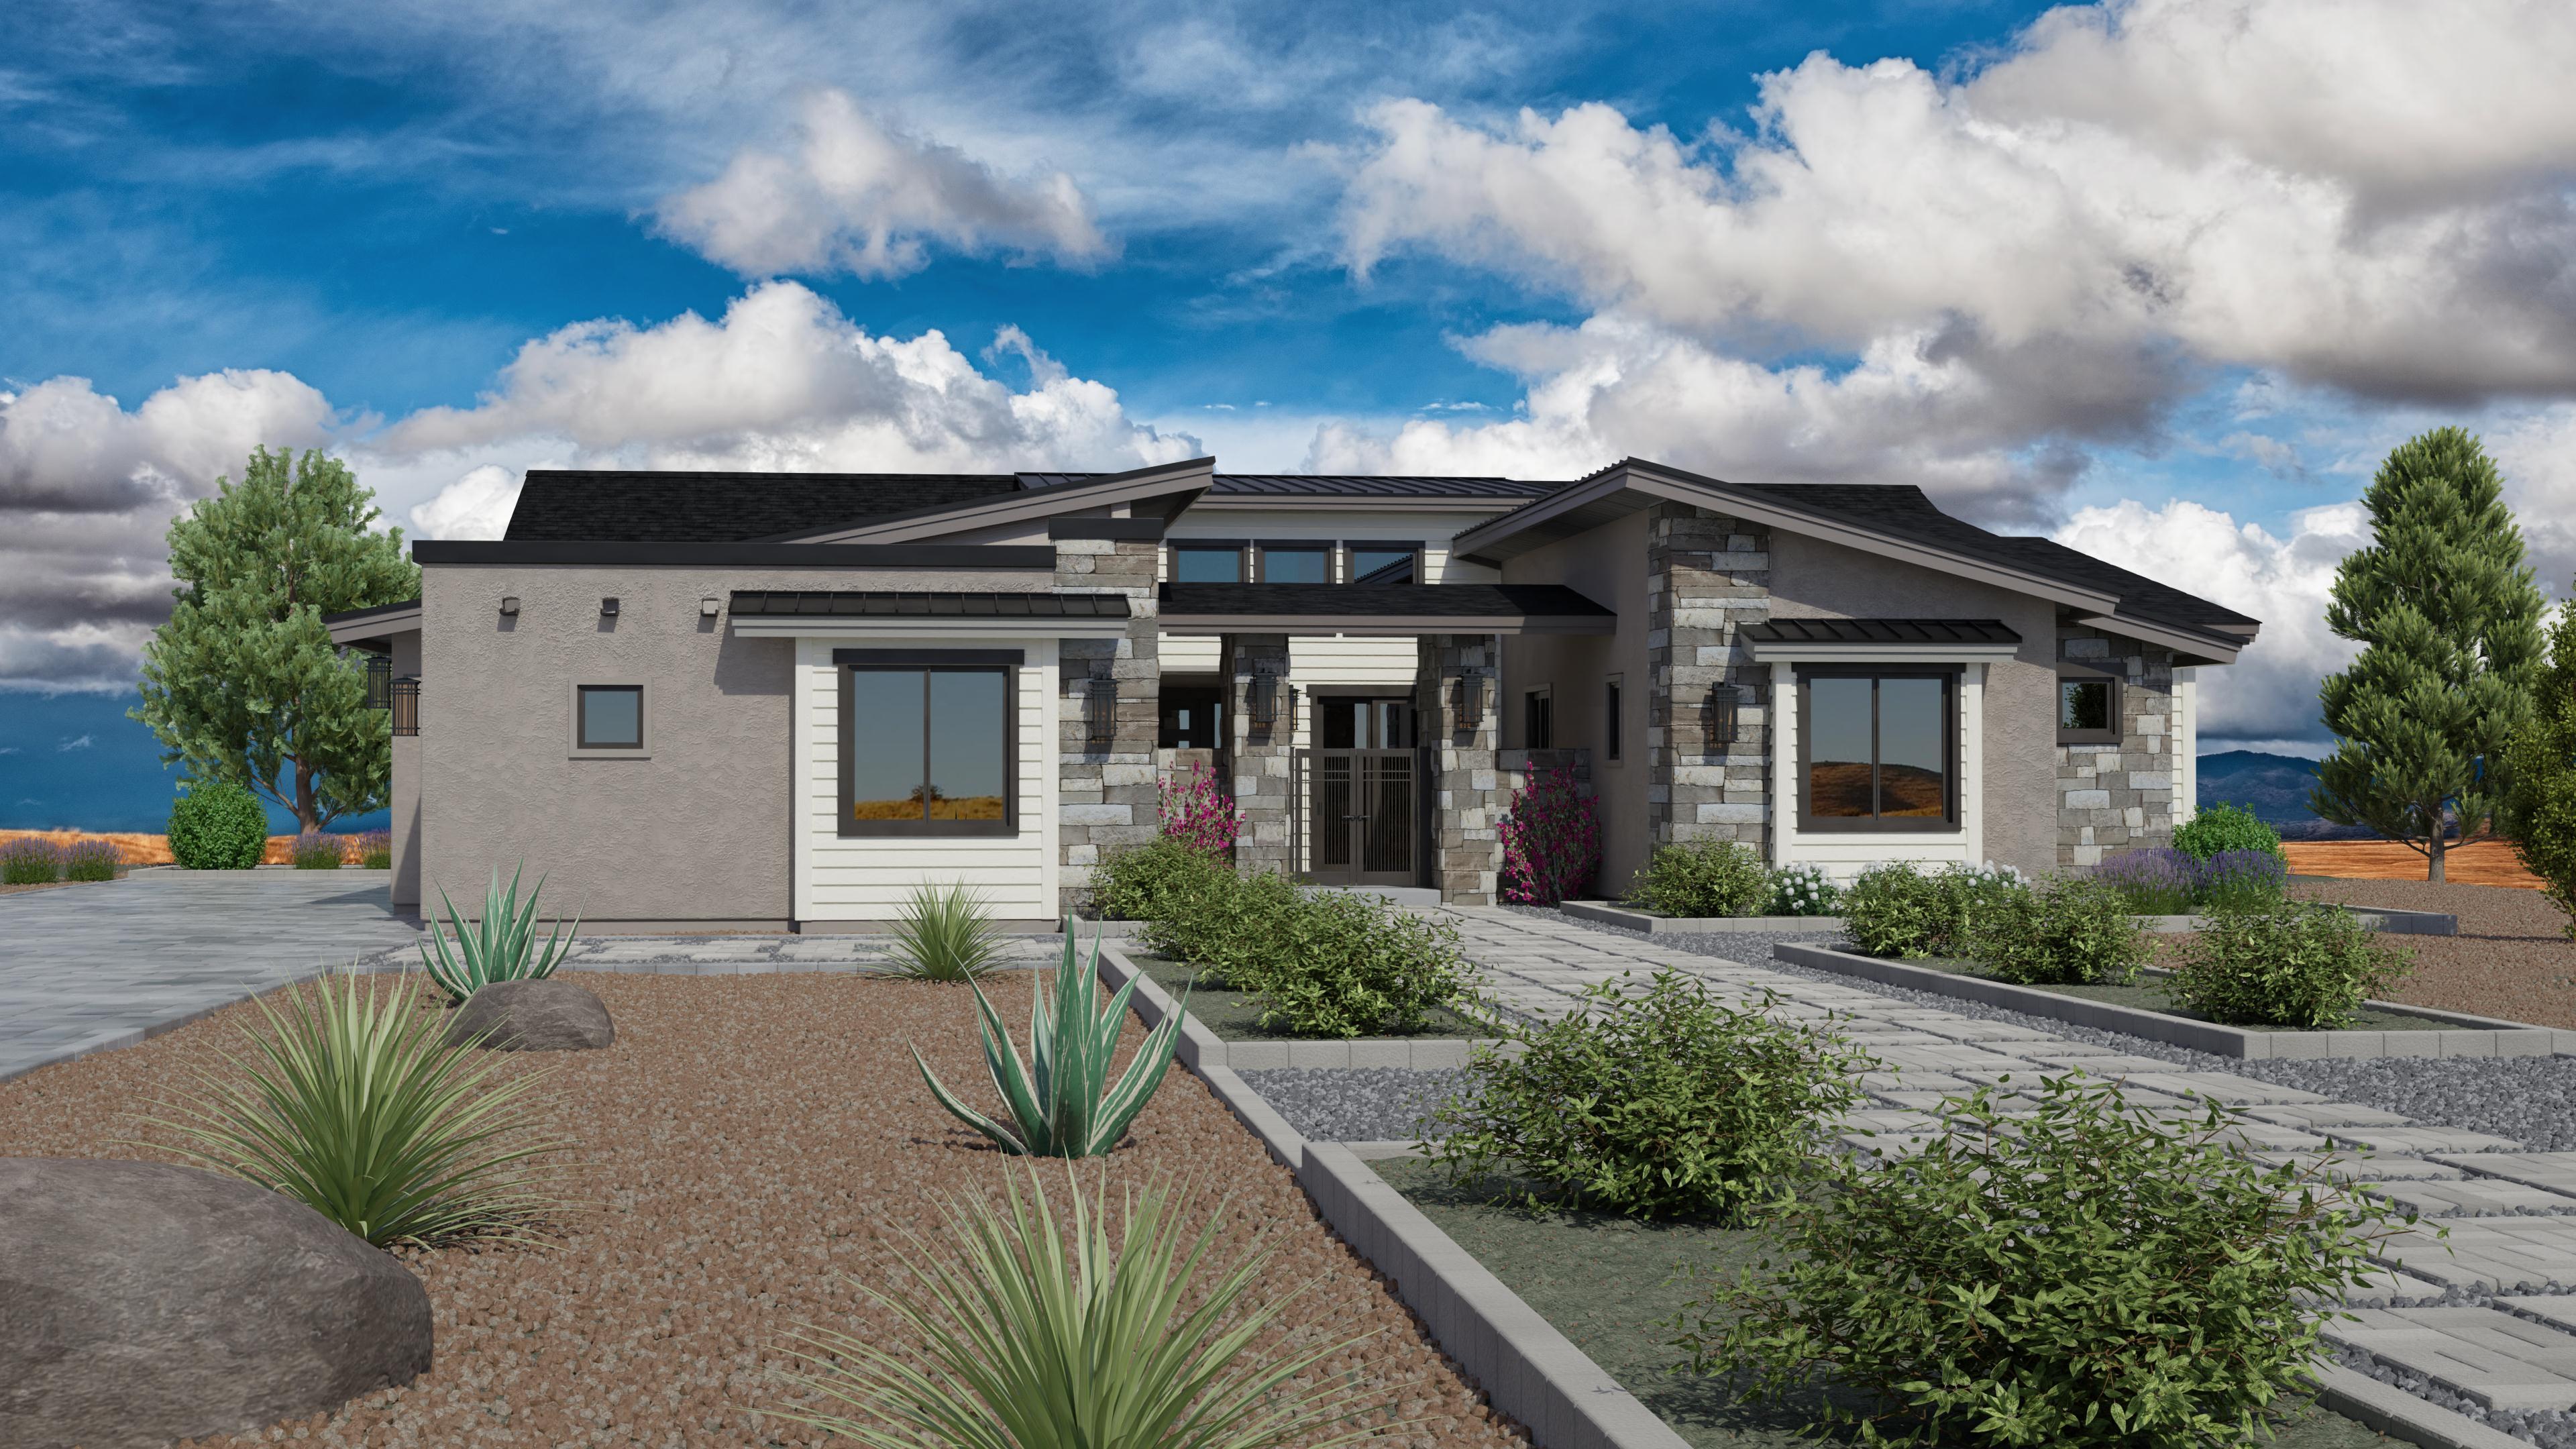 Exterior featured in the Jasper Featured Plan 2672 By Capstone Homes in Prescott, AZ